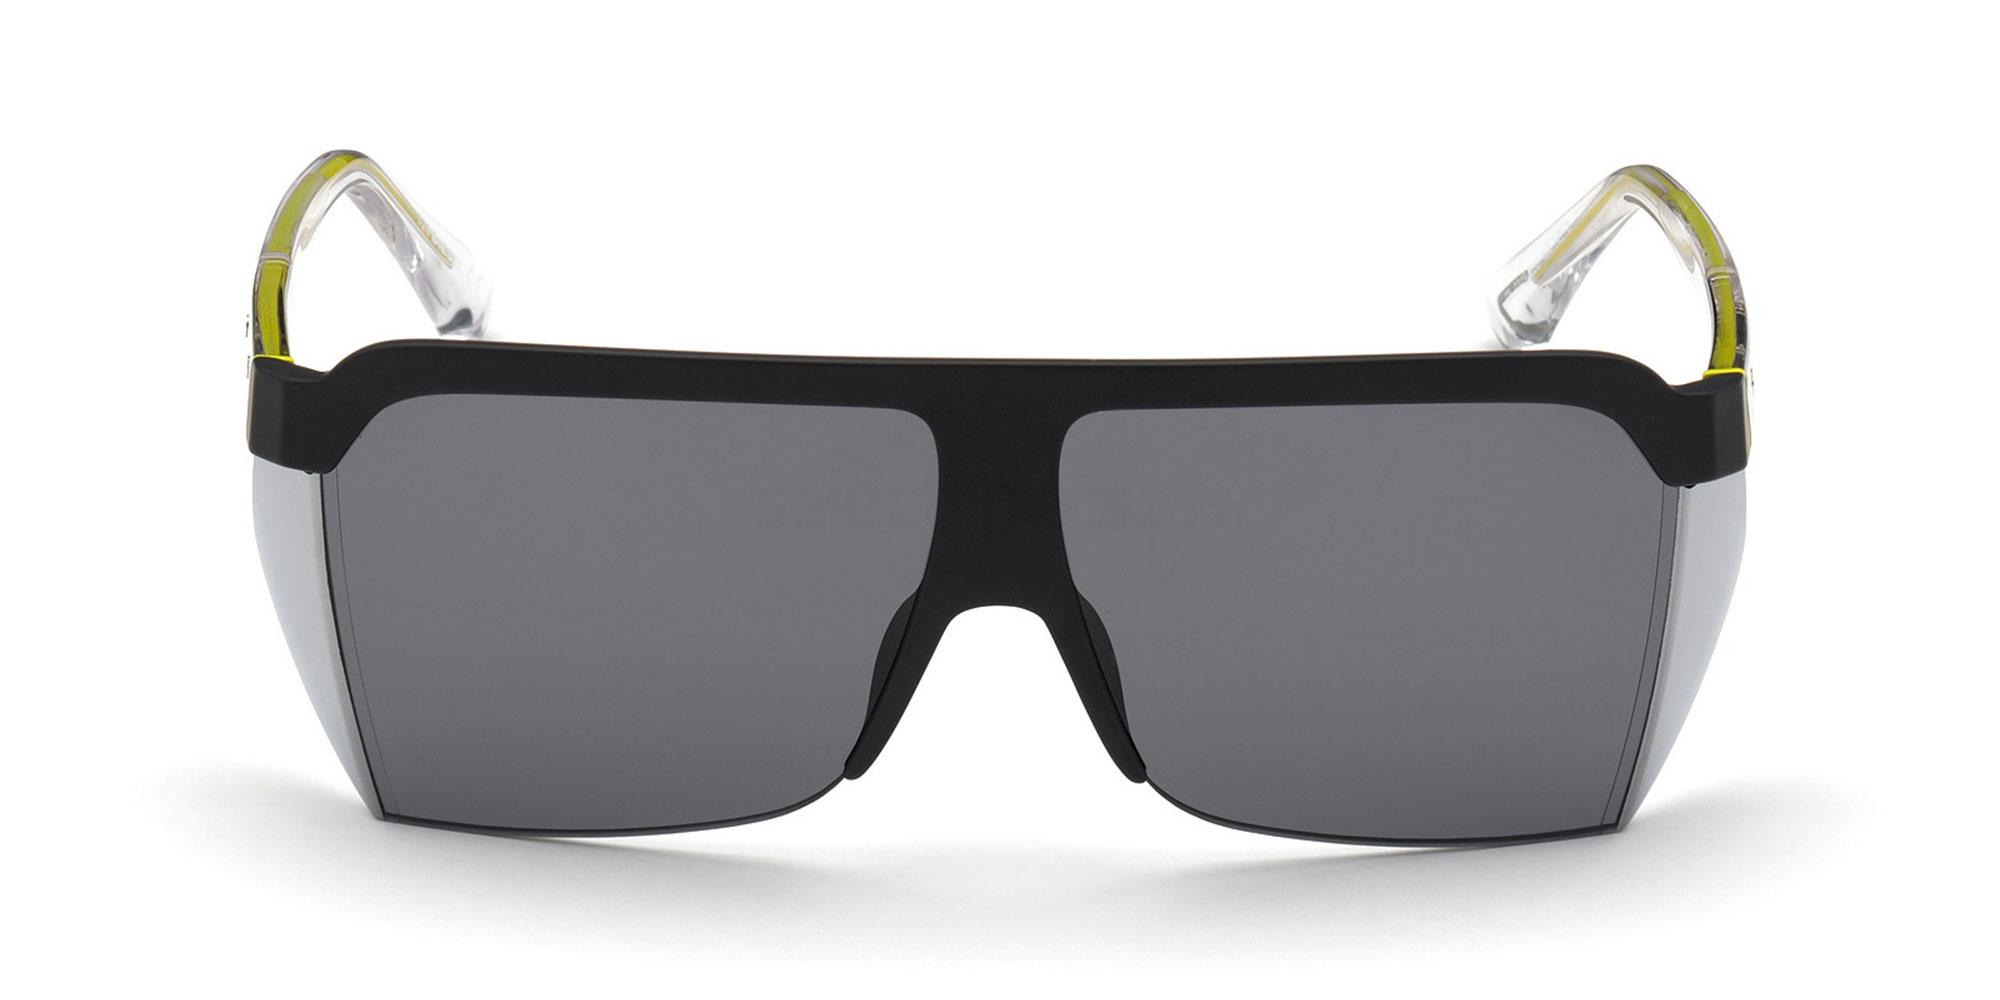 02C DL0319 Sunglasses, Diesel